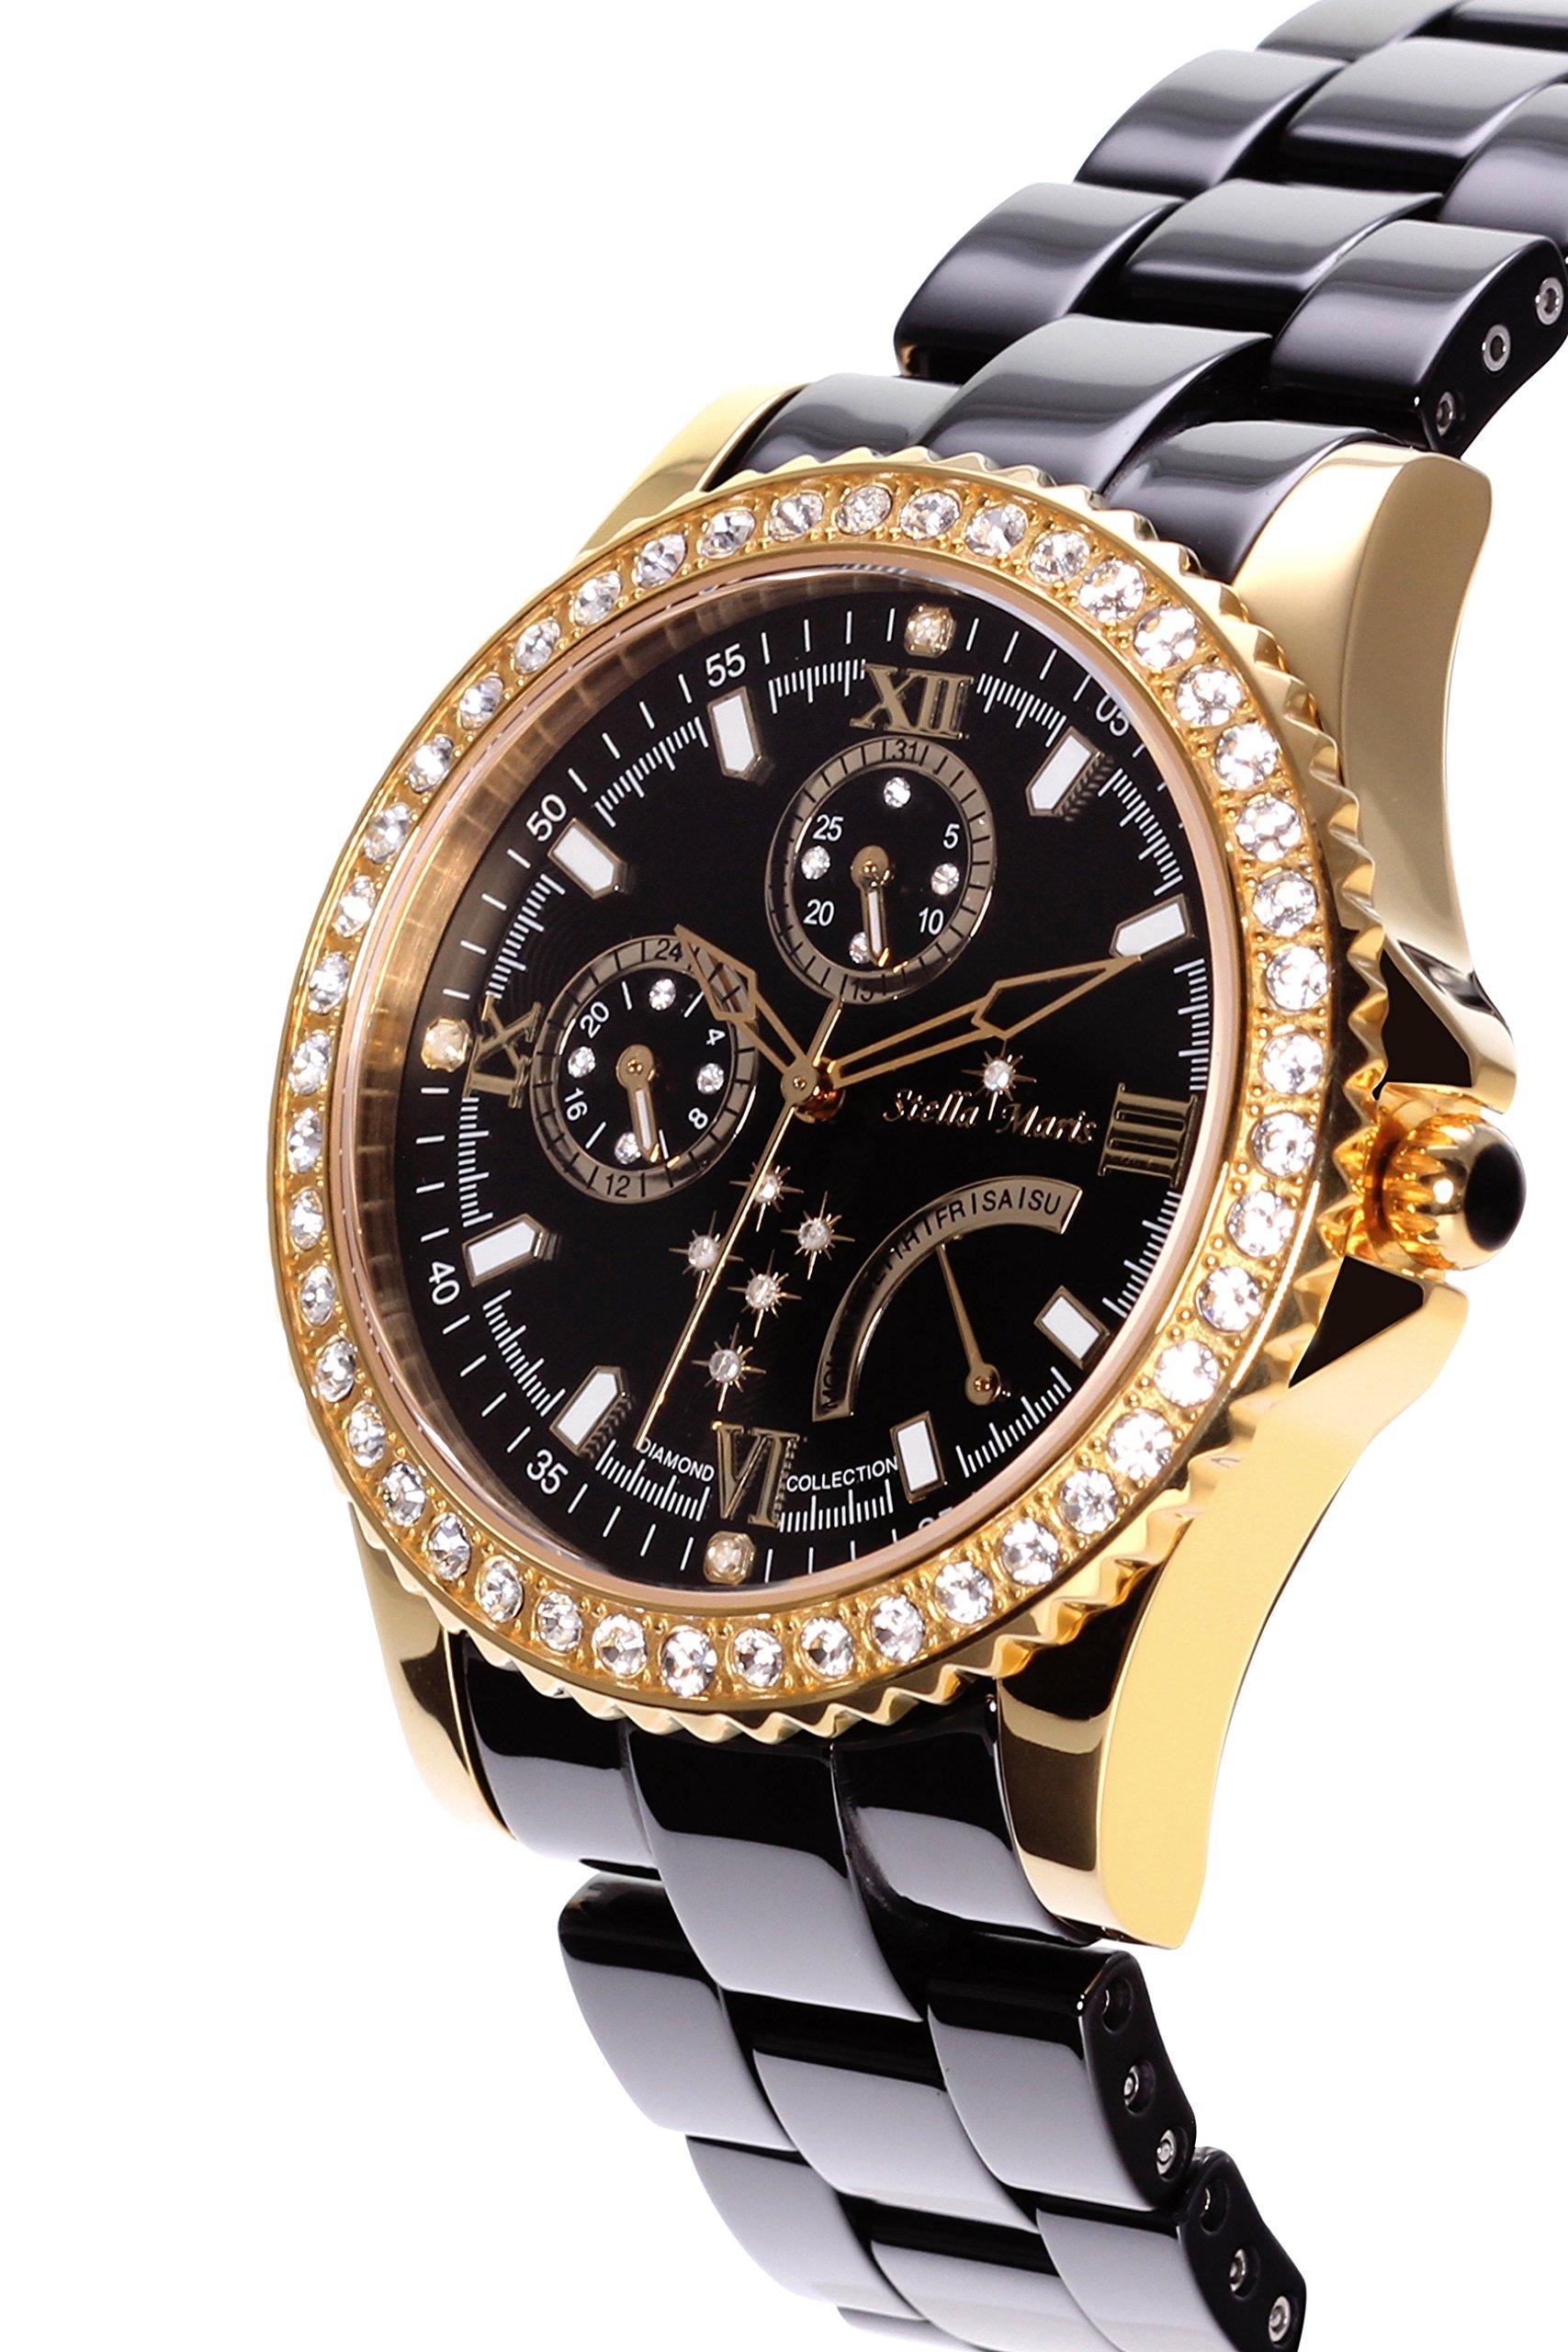 Stella-Maris-Damen-Armbanduhr-Analog-Quarz-Uhr-Stilvolle-Elegante-Damenuhr-Frauenuhr-Schwarz-Gold-Premium-Keramik-Armband-Diamanten-Swarovski-STM15N6